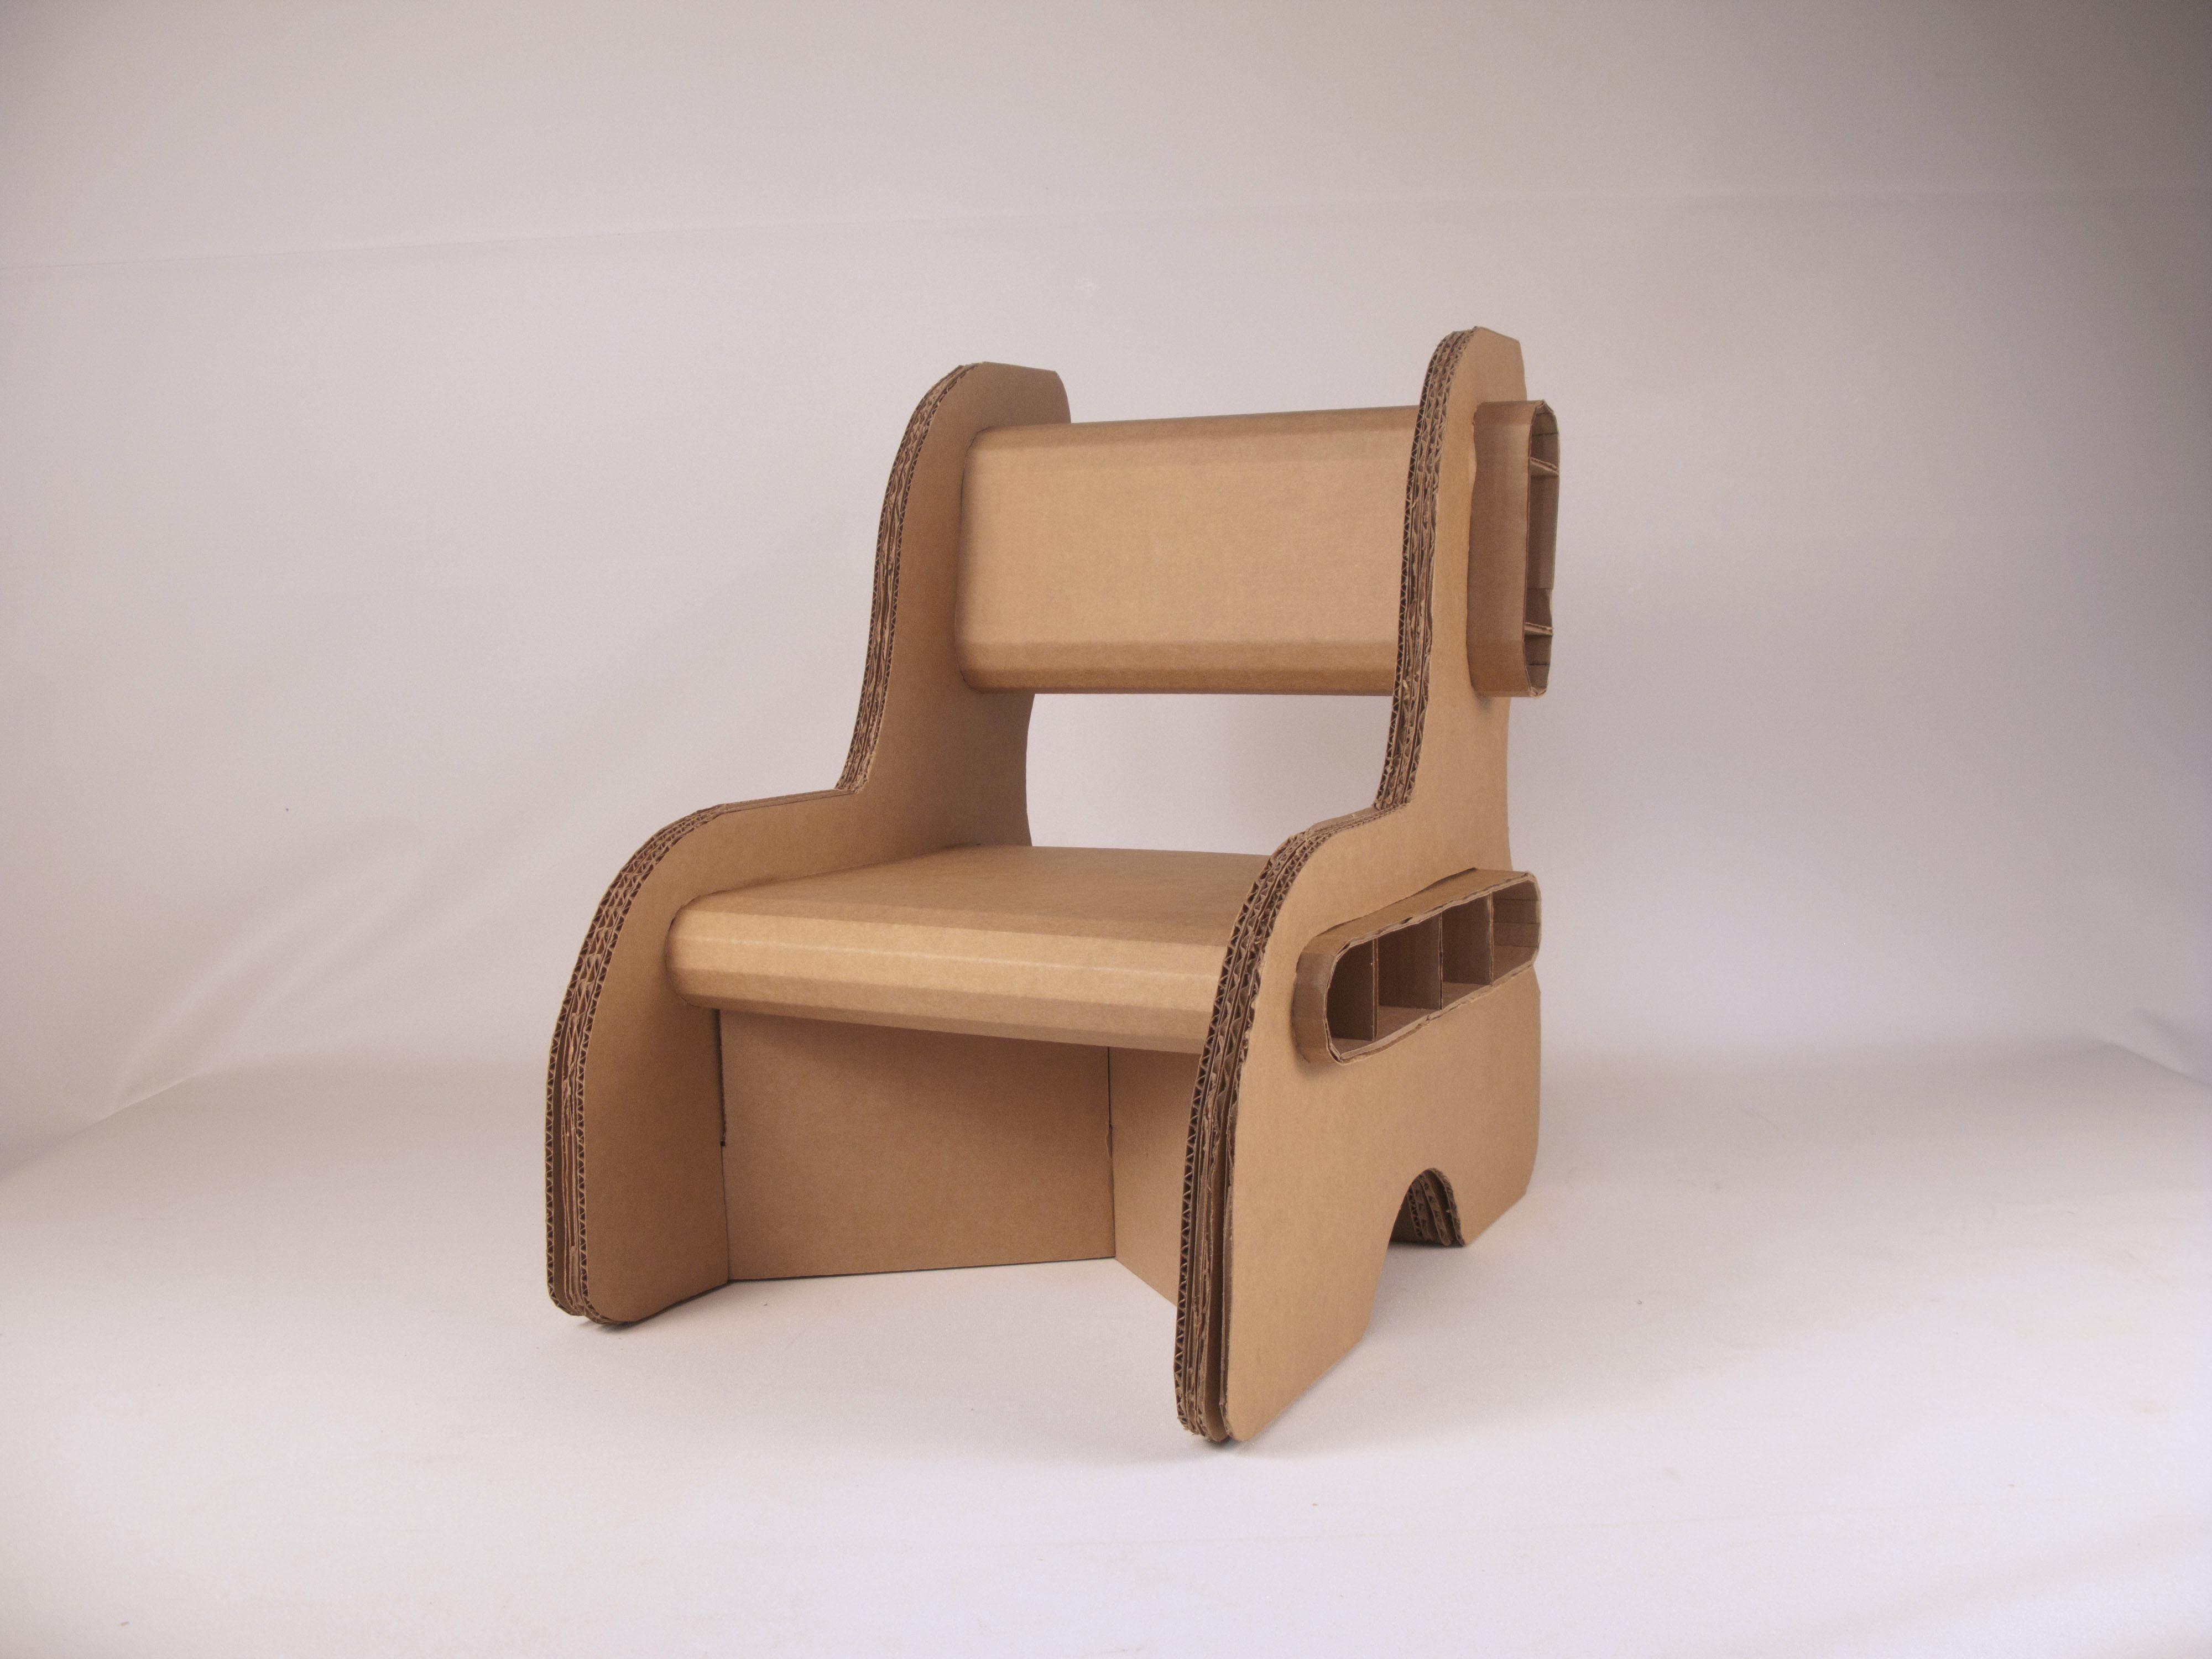 cardboard chair template - Google Search | Cool Designs ...